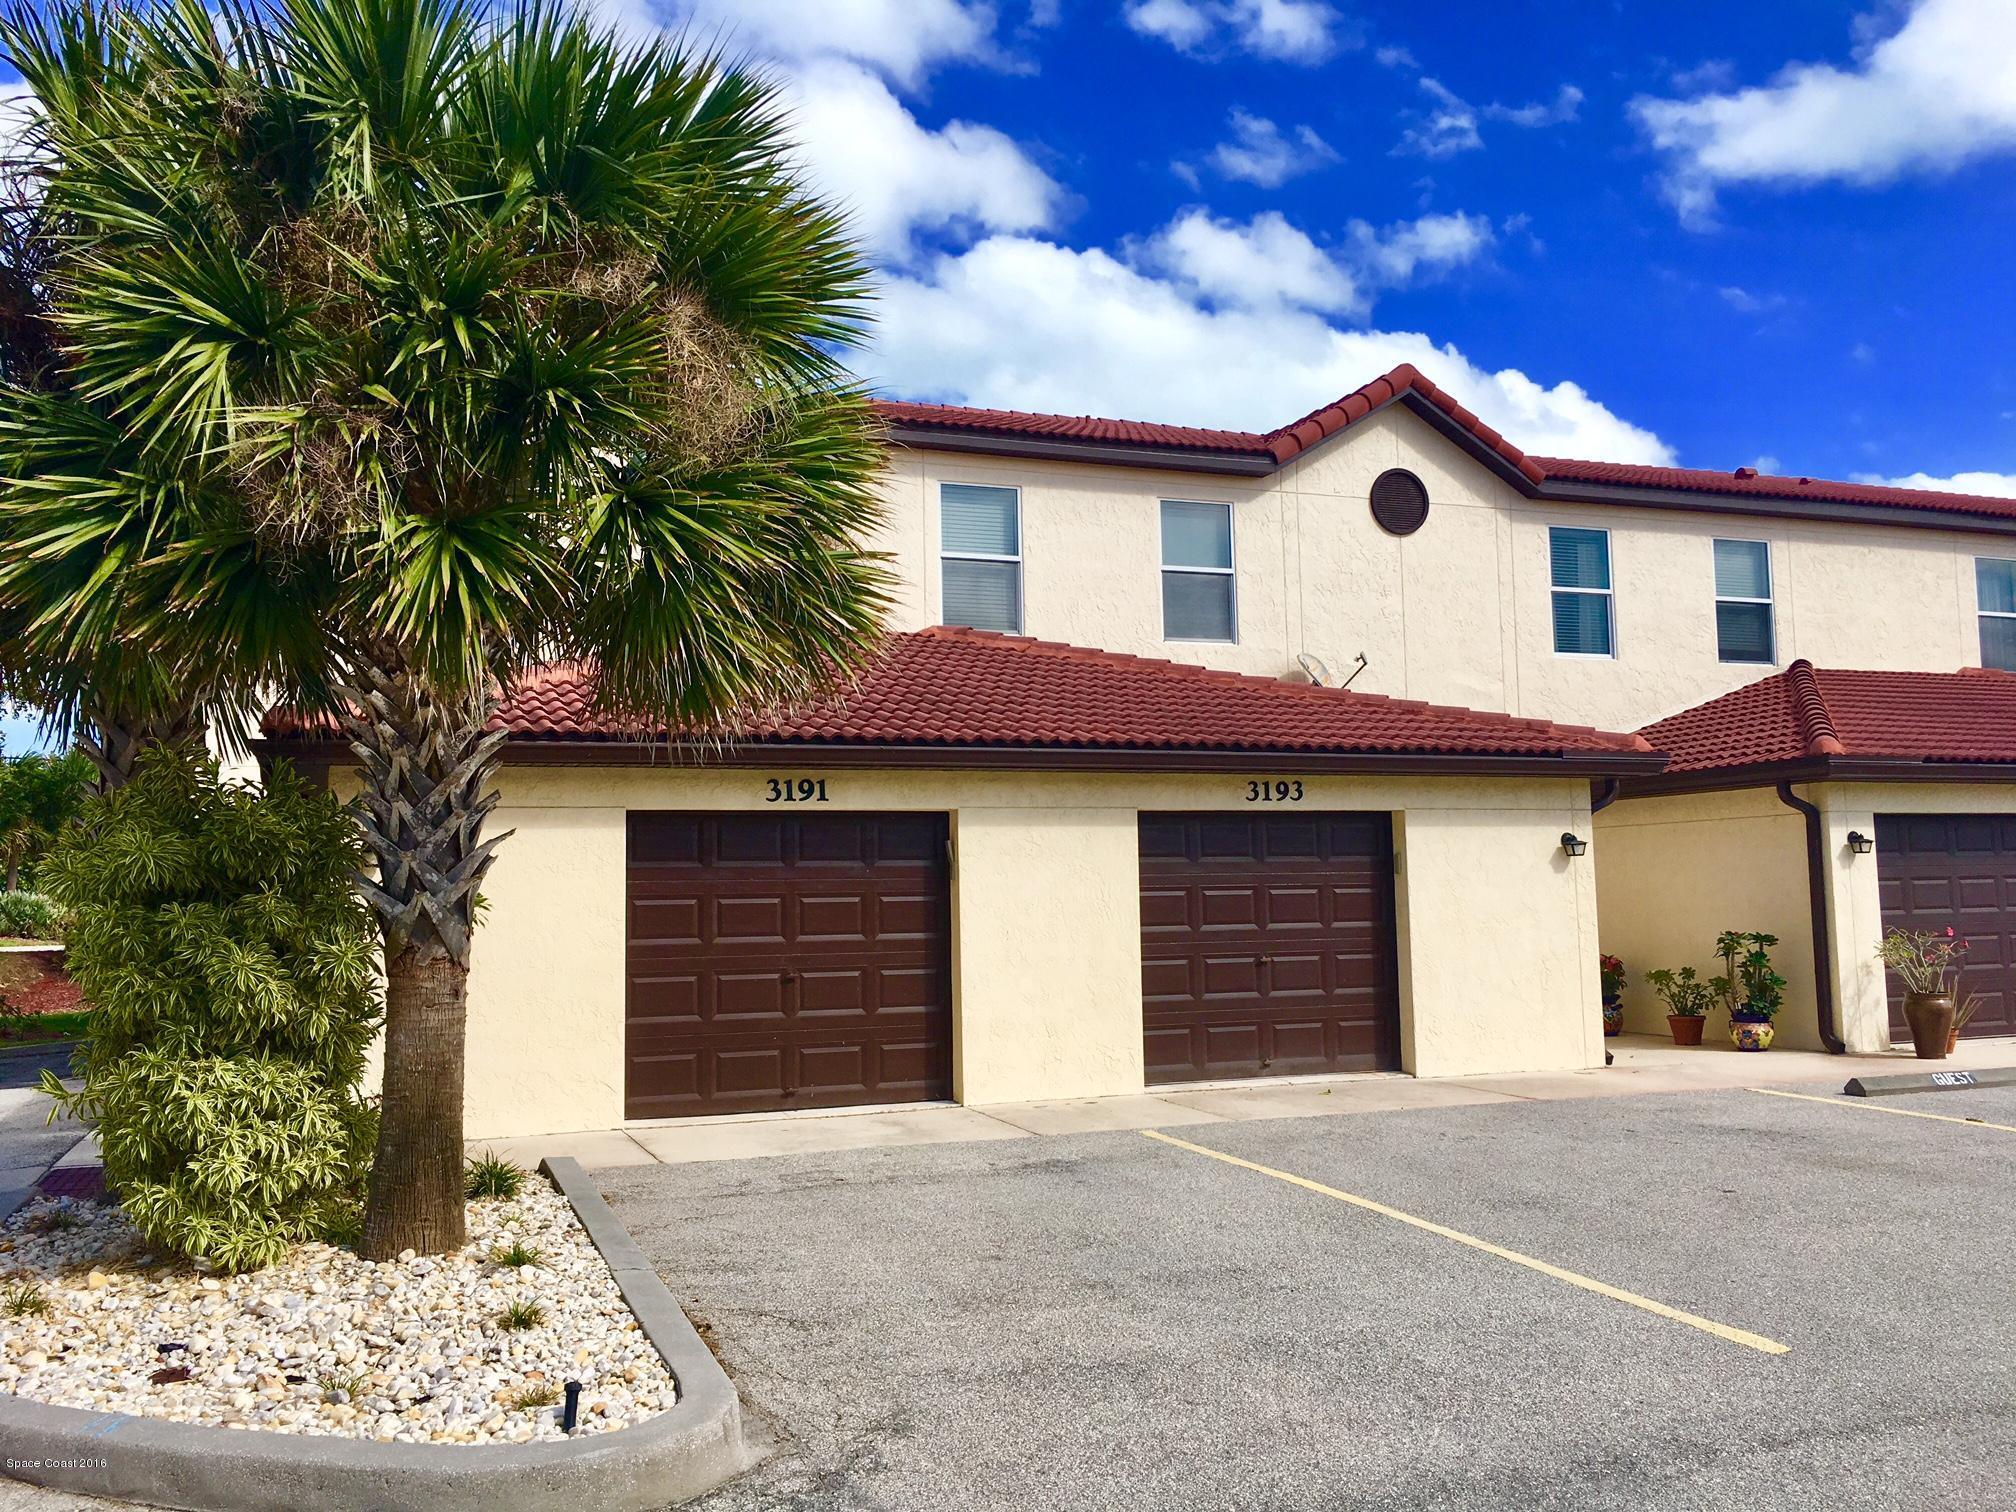 Single Family Home for Rent at 3191 Ricks 3191 Ricks Melbourne Beach, Florida 32951 United States